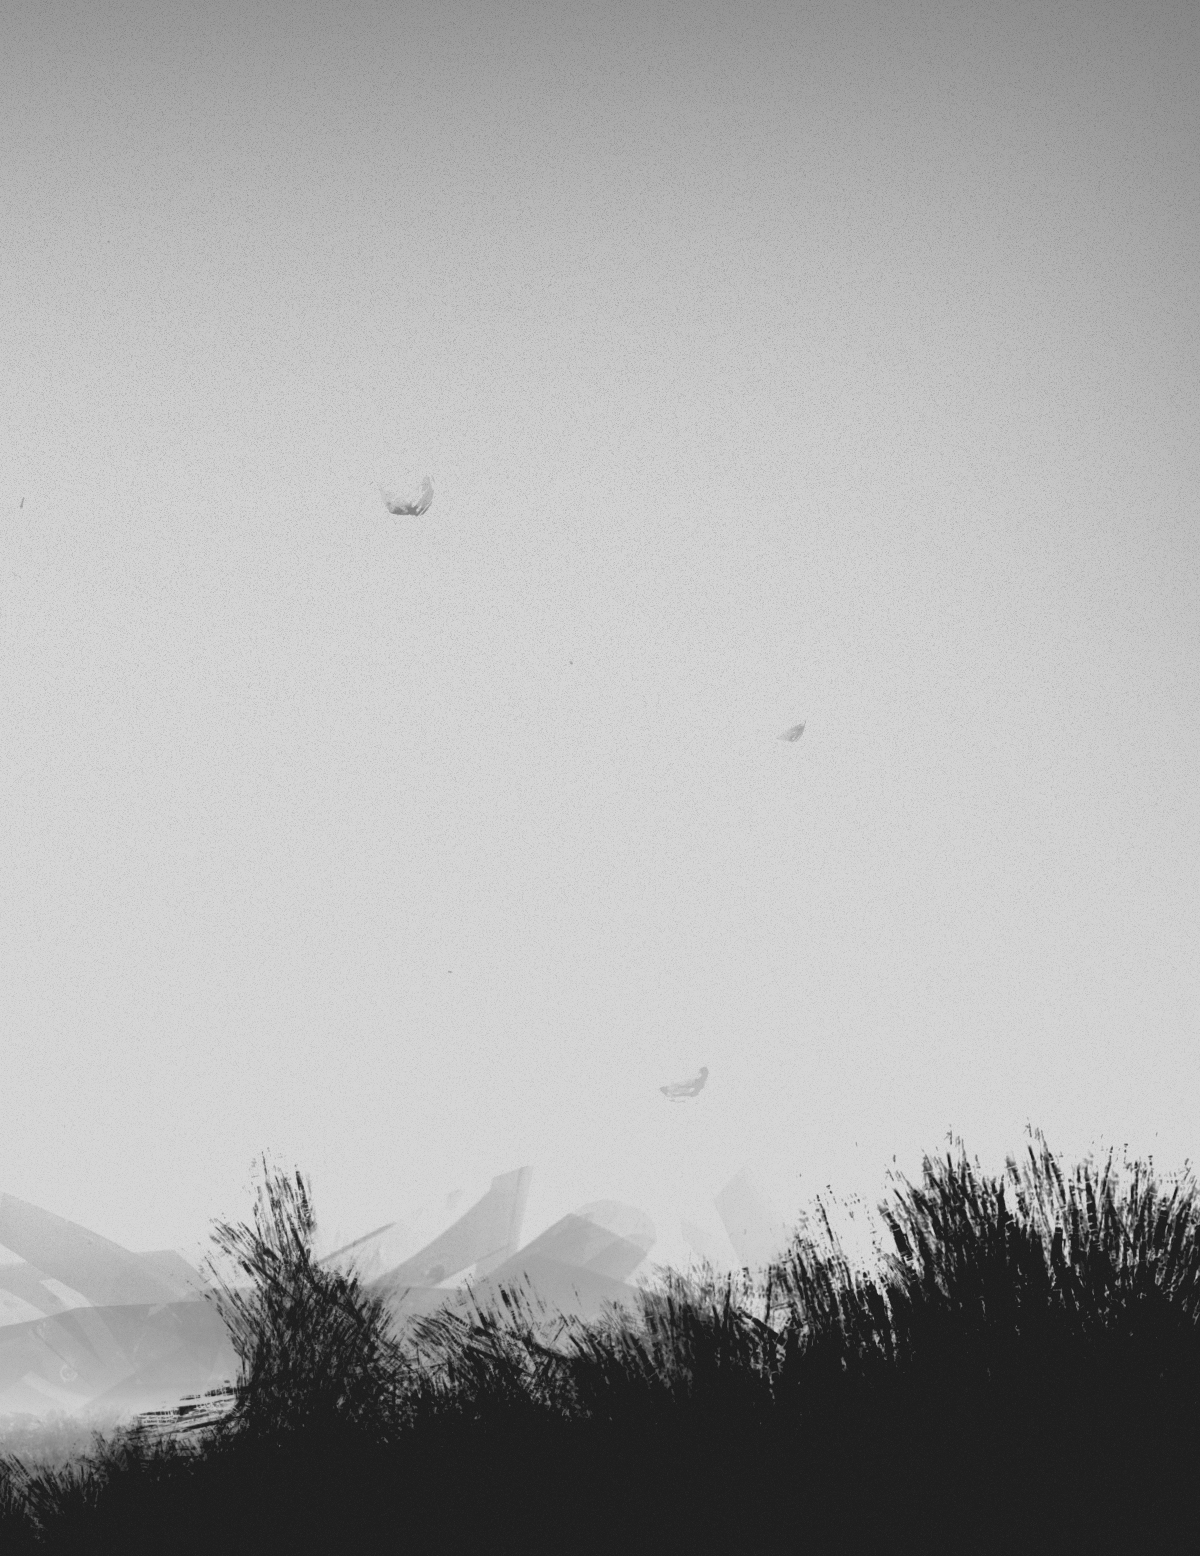 Landscape monochrome black and white Sun dust grass human noise dark empty unknown lonely pessimistic calm